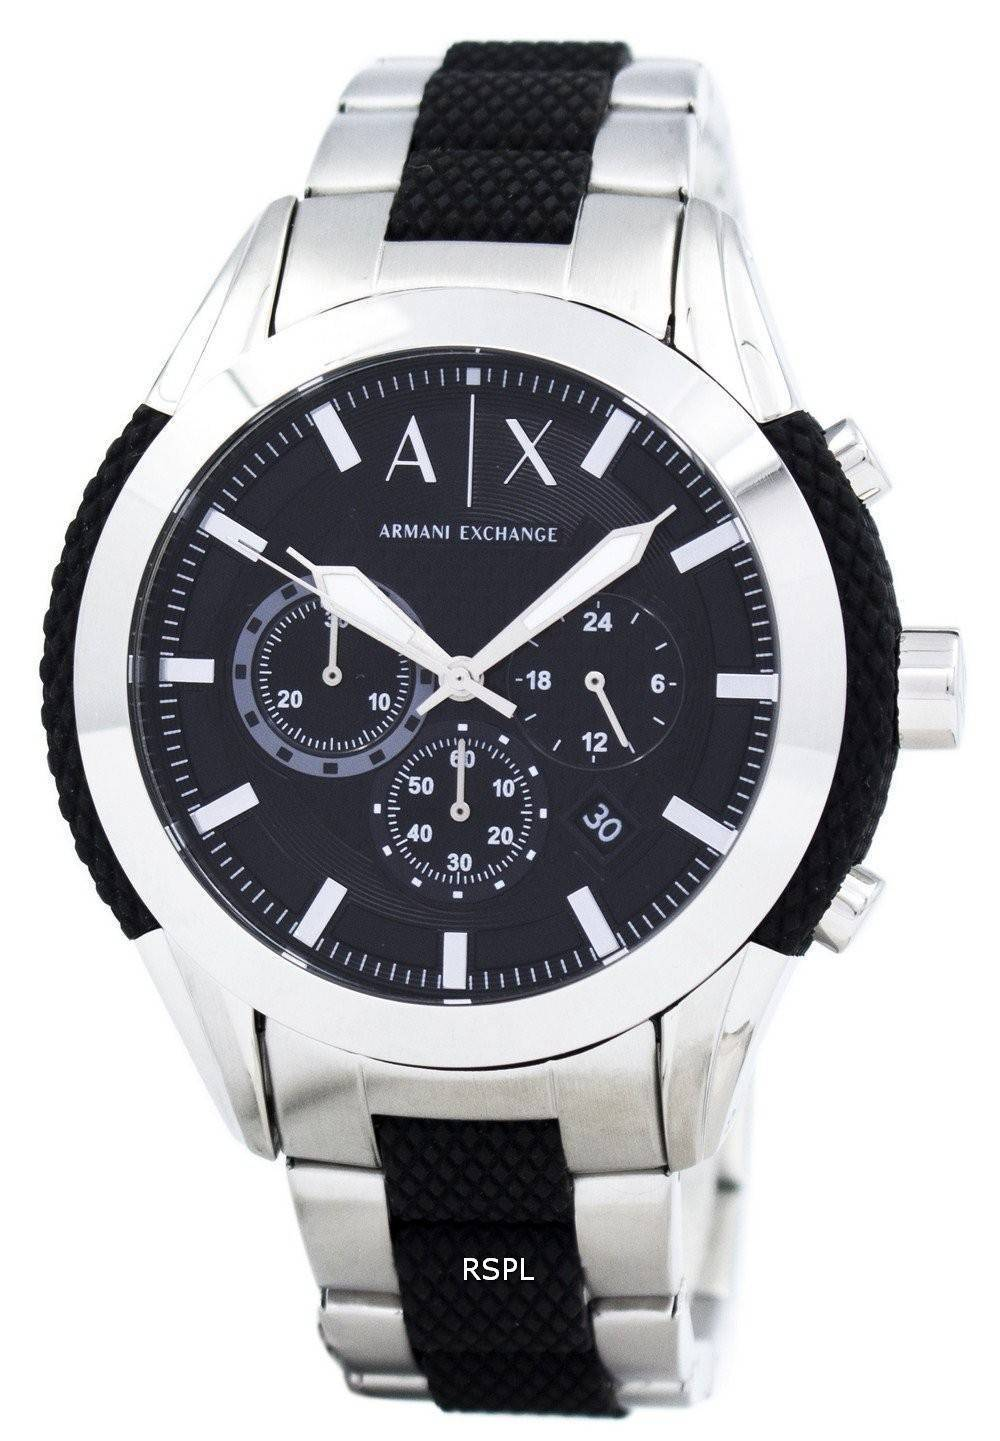 8fd5c3eede Armani Exchange chronographe cadran noir AX1214 montre homme France